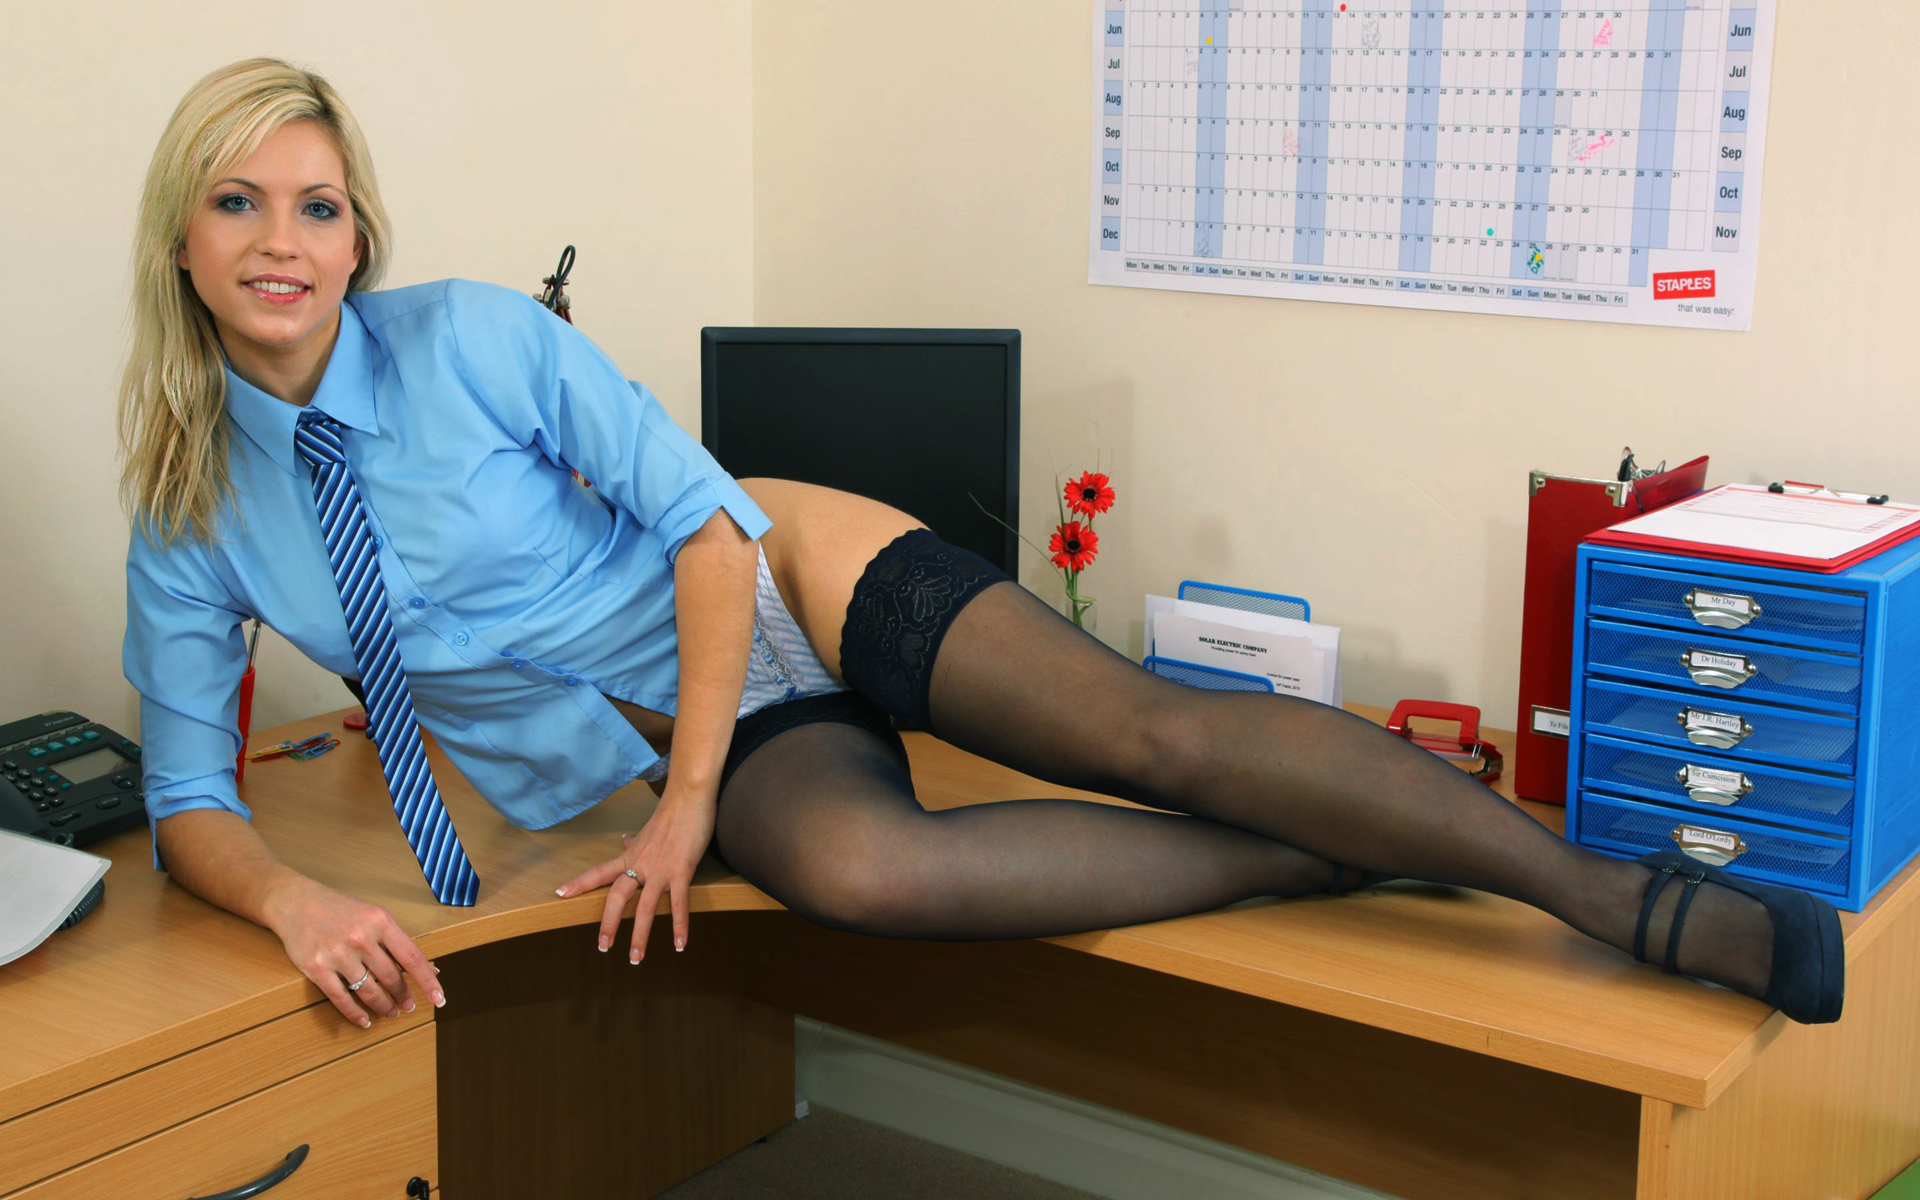 Трахнул медсестру у неё в кабинете, Клиент трахнул медсестру в кабинете 22 фотография